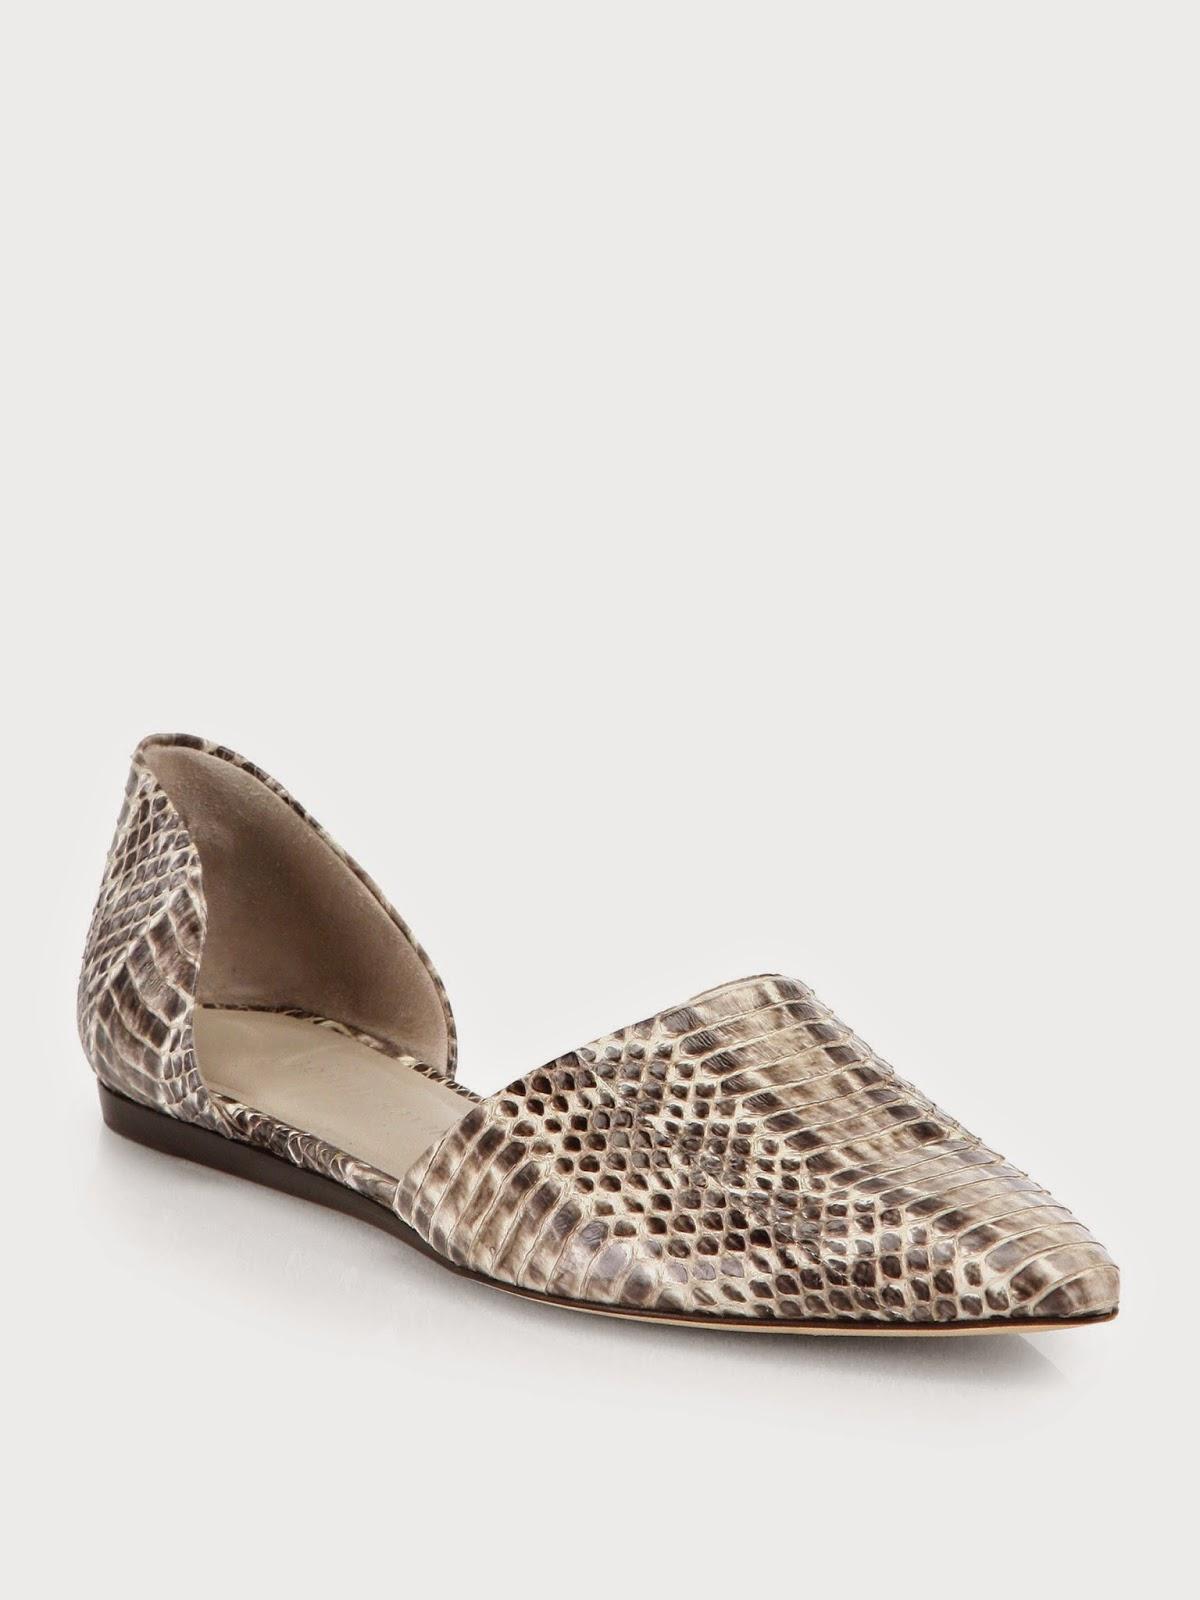 Saks Fifth Ave Jenni Kayne snake embossed leather d'Orsay flats